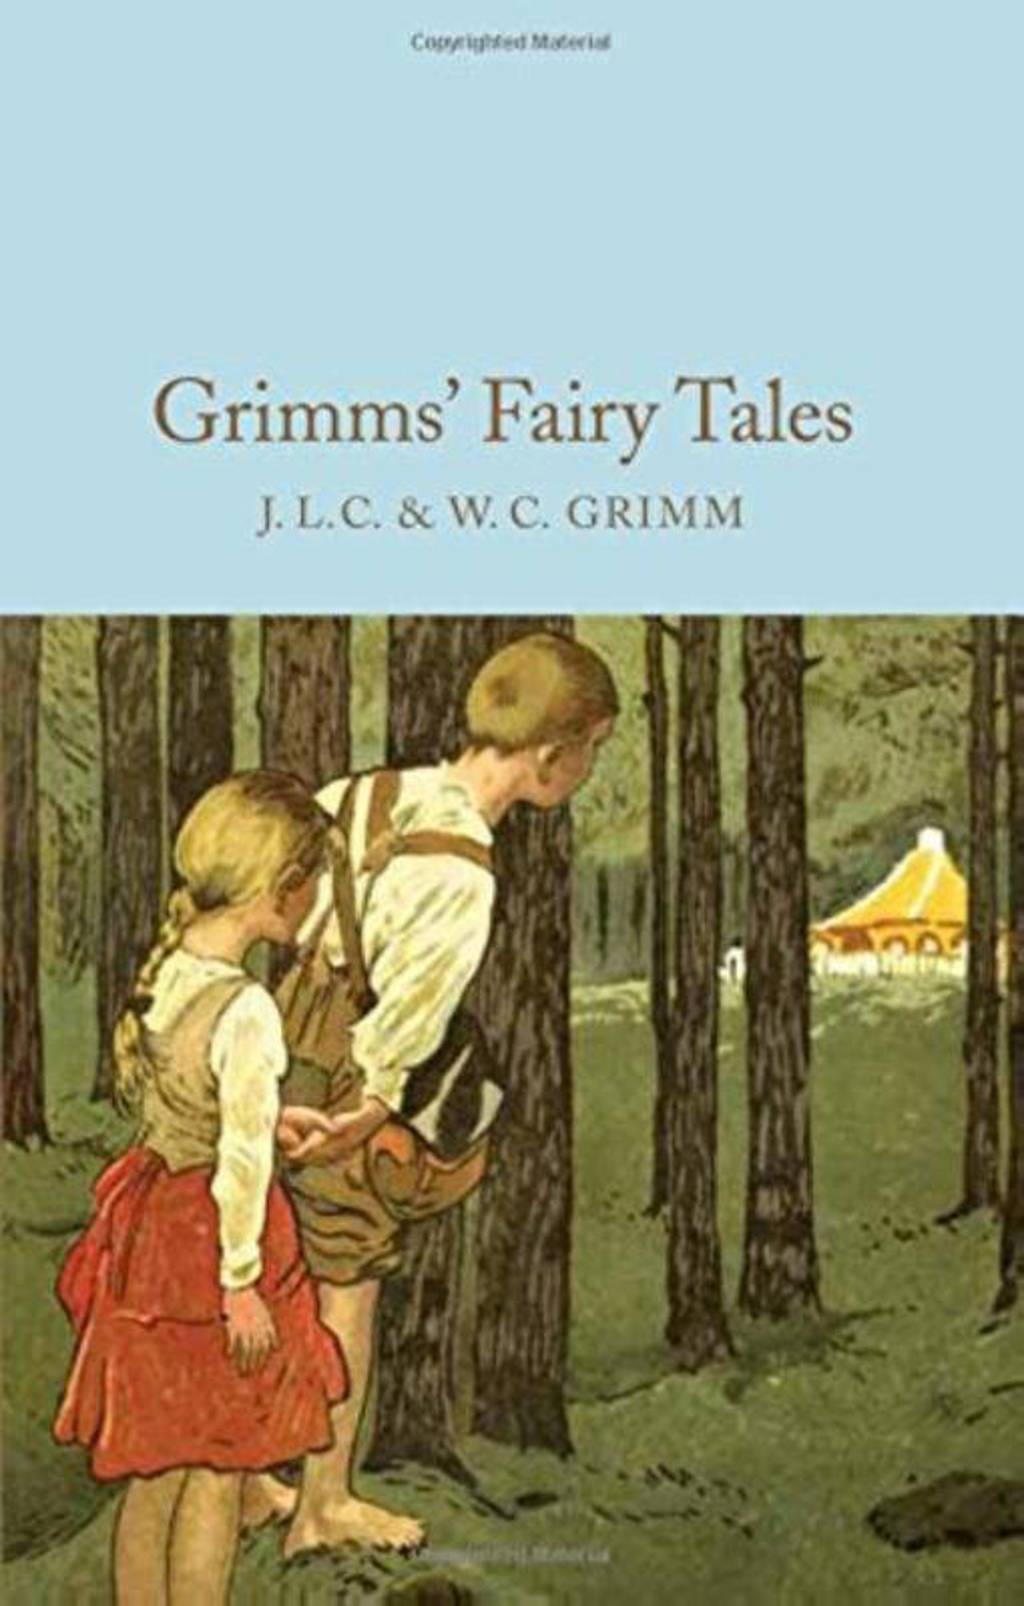 Grimms' Fairy Tales - Brothers Grimm en Grimm, W. c.